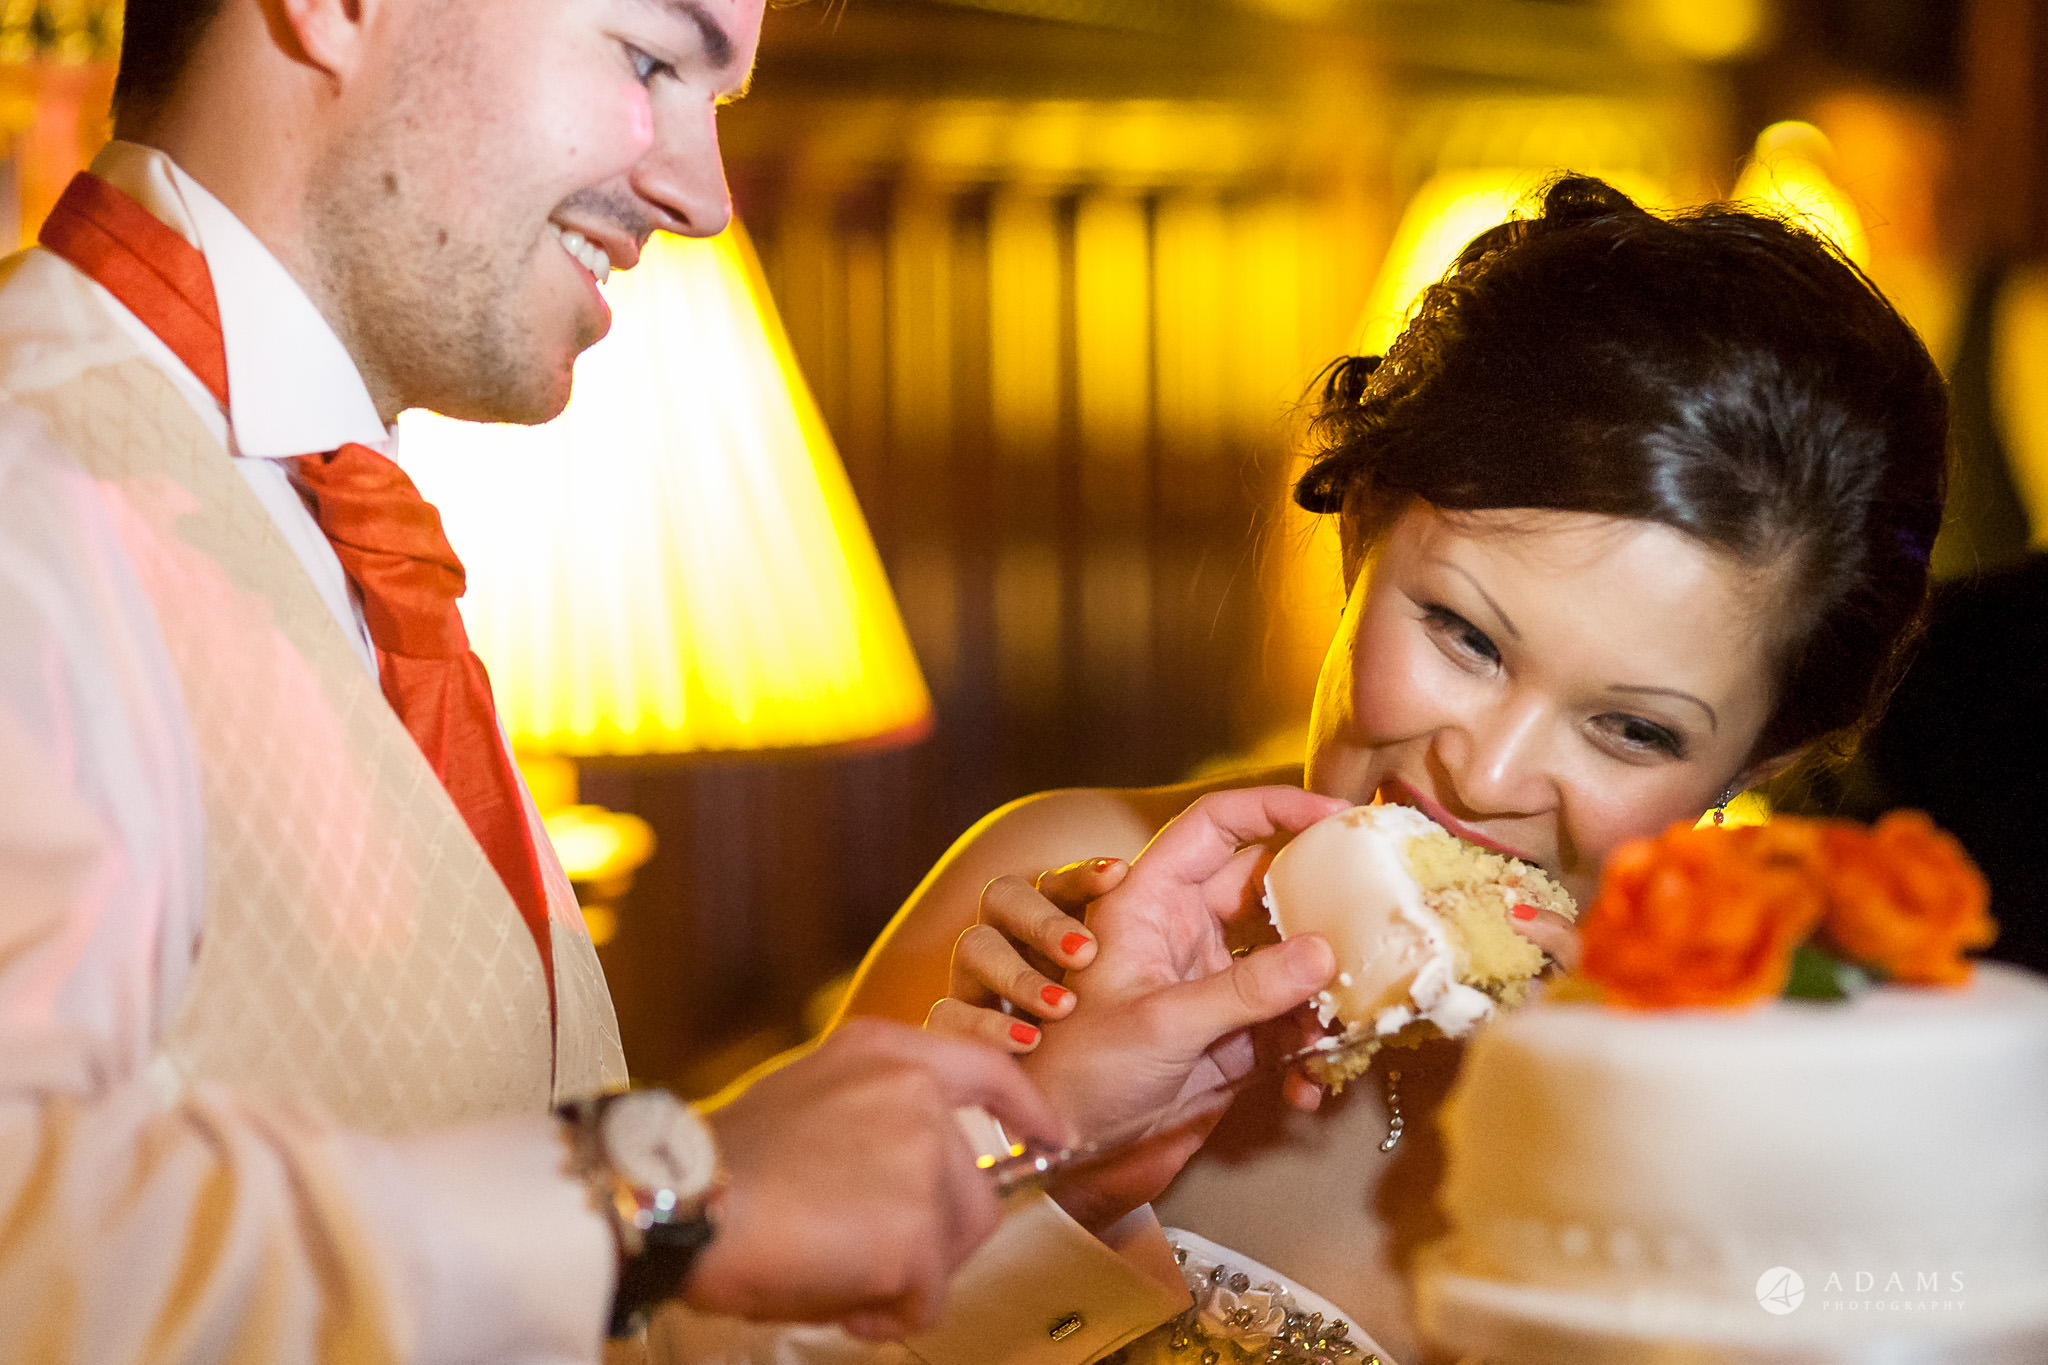 St Audries Park wedding cake cutting